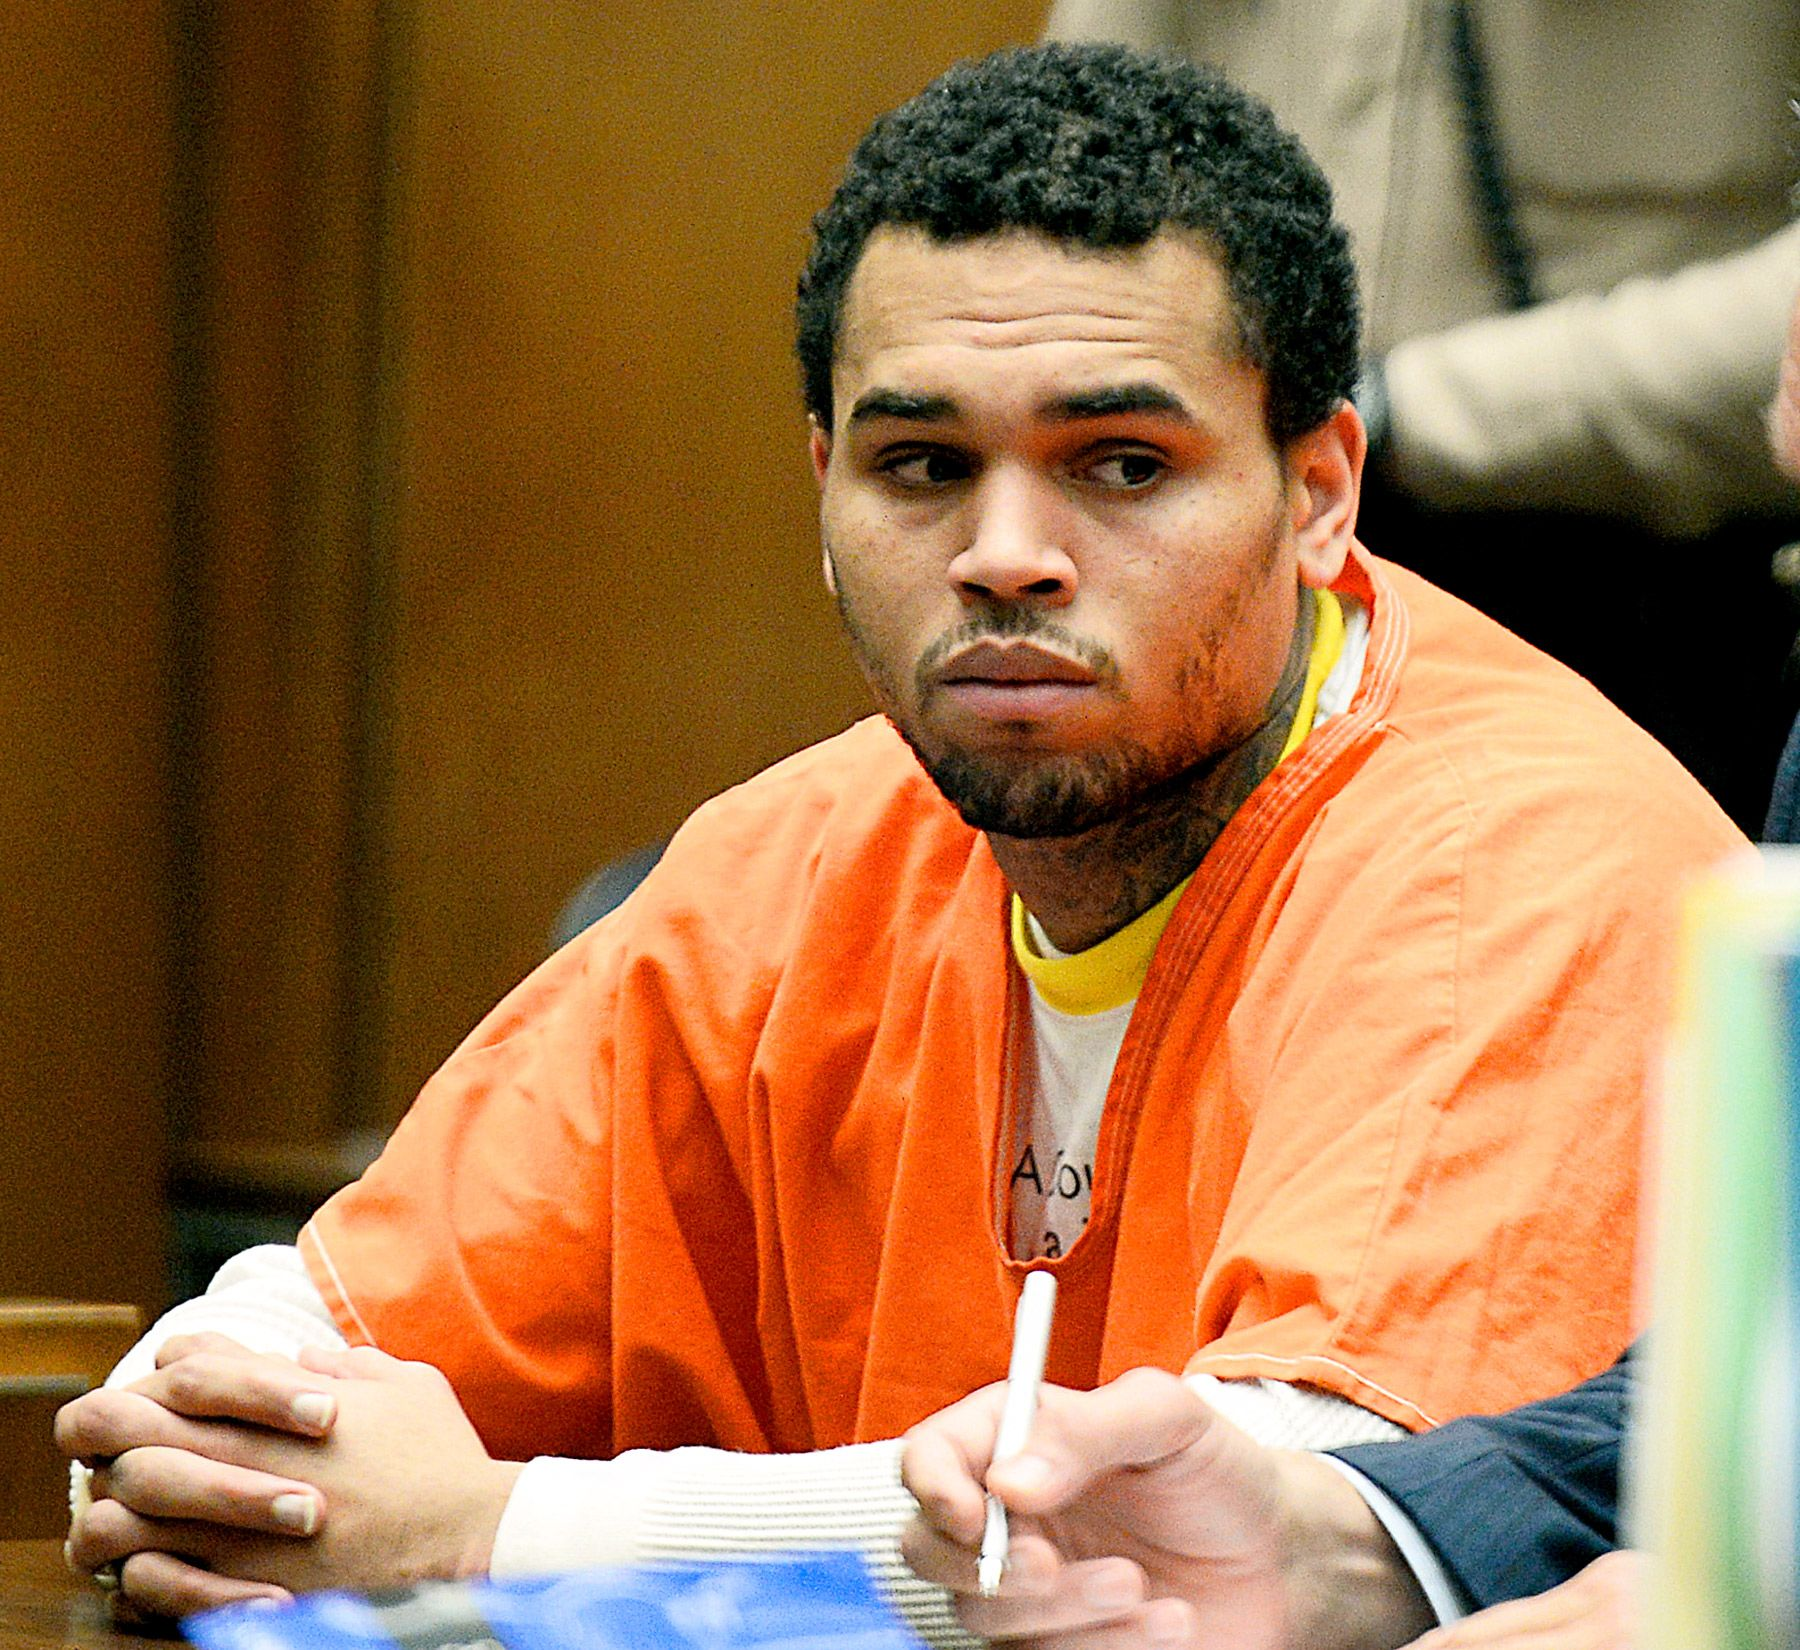 Chris Brown Mugshot Celebrity Wreckage Pinterest